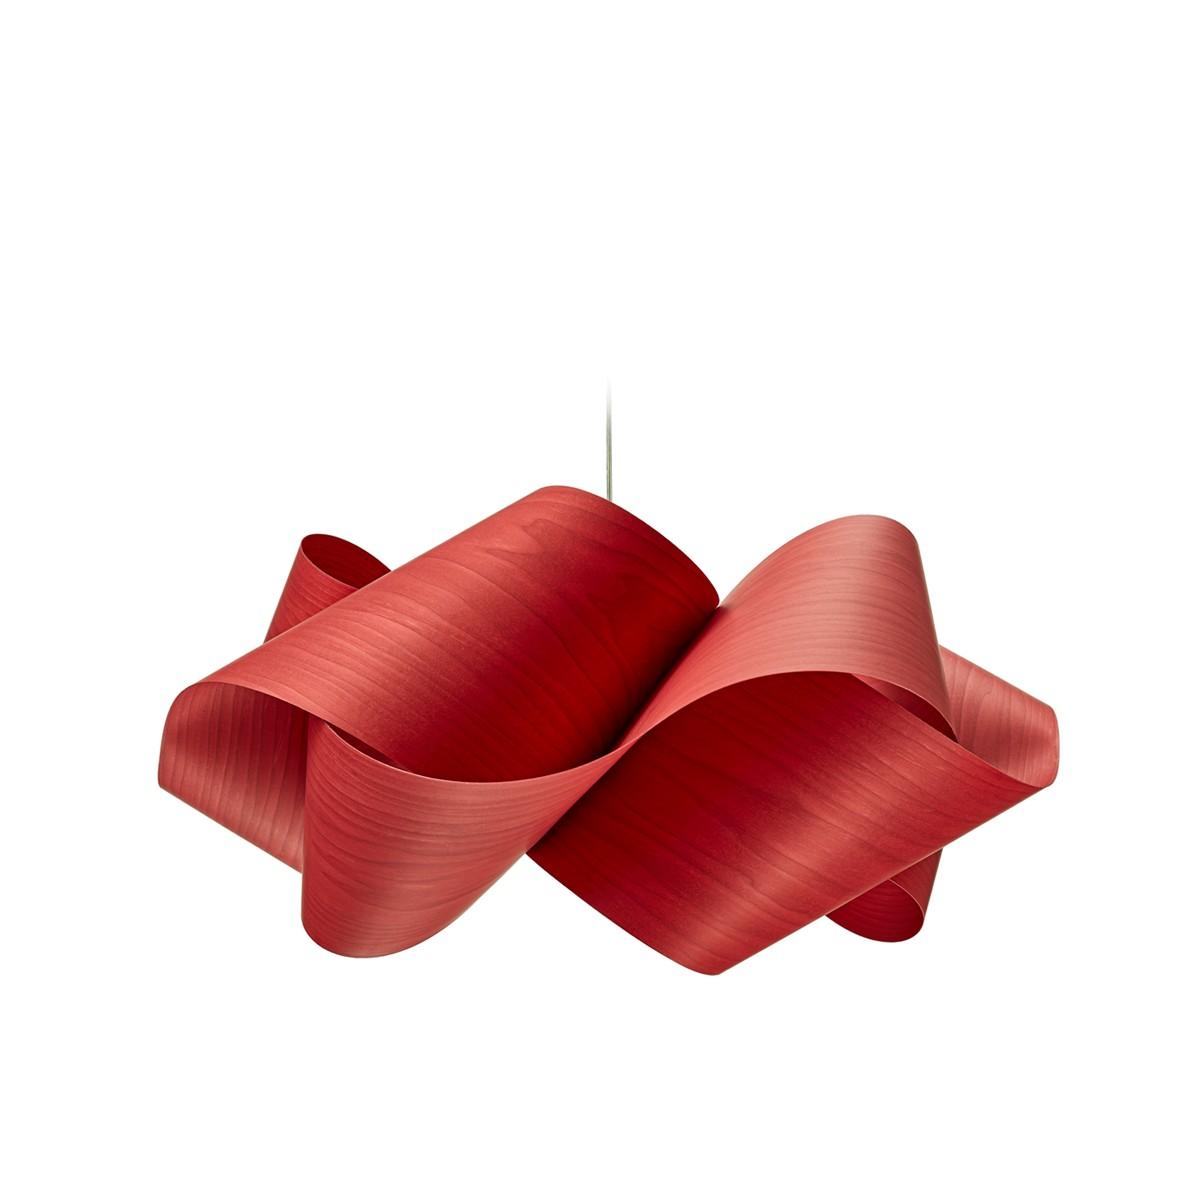 LZF Lamps Swirl Small Pendelleuchte, rot